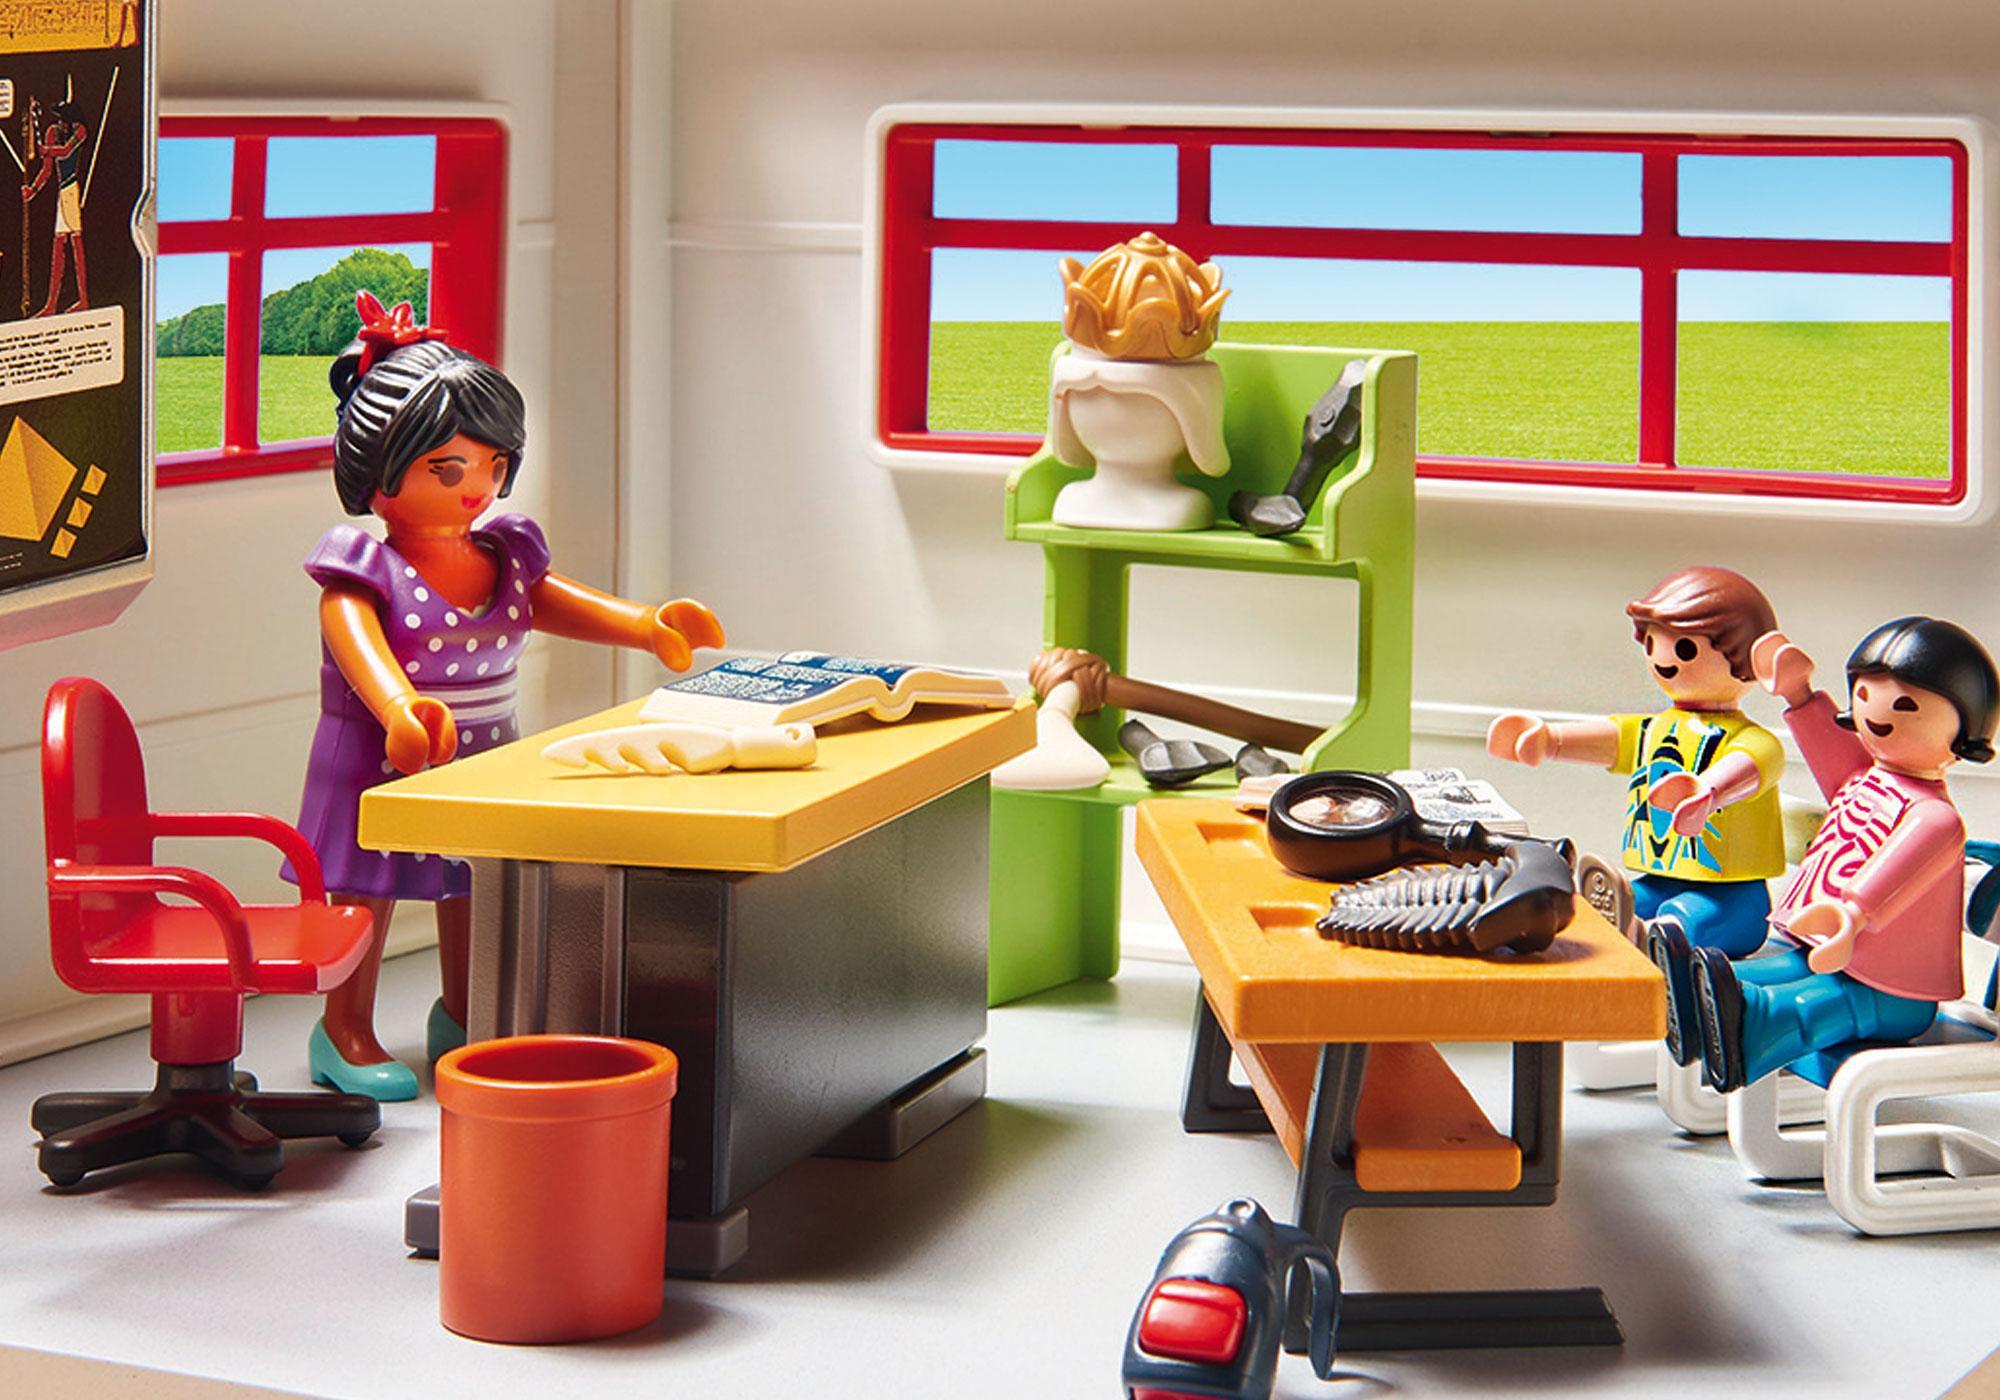 http://media.playmobil.com/i/playmobil/9455_product_extra1/Klassenzimmer Geschichtsunterricht